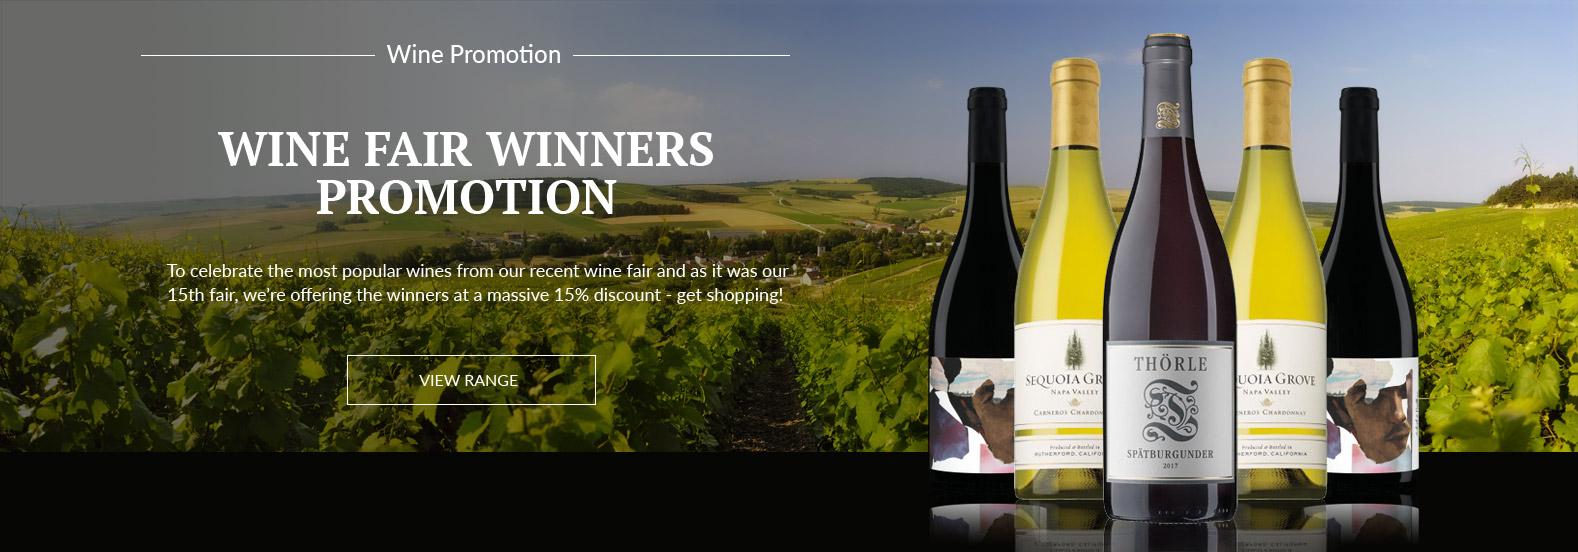 Wine Fair Winners Promotion - 15% Off